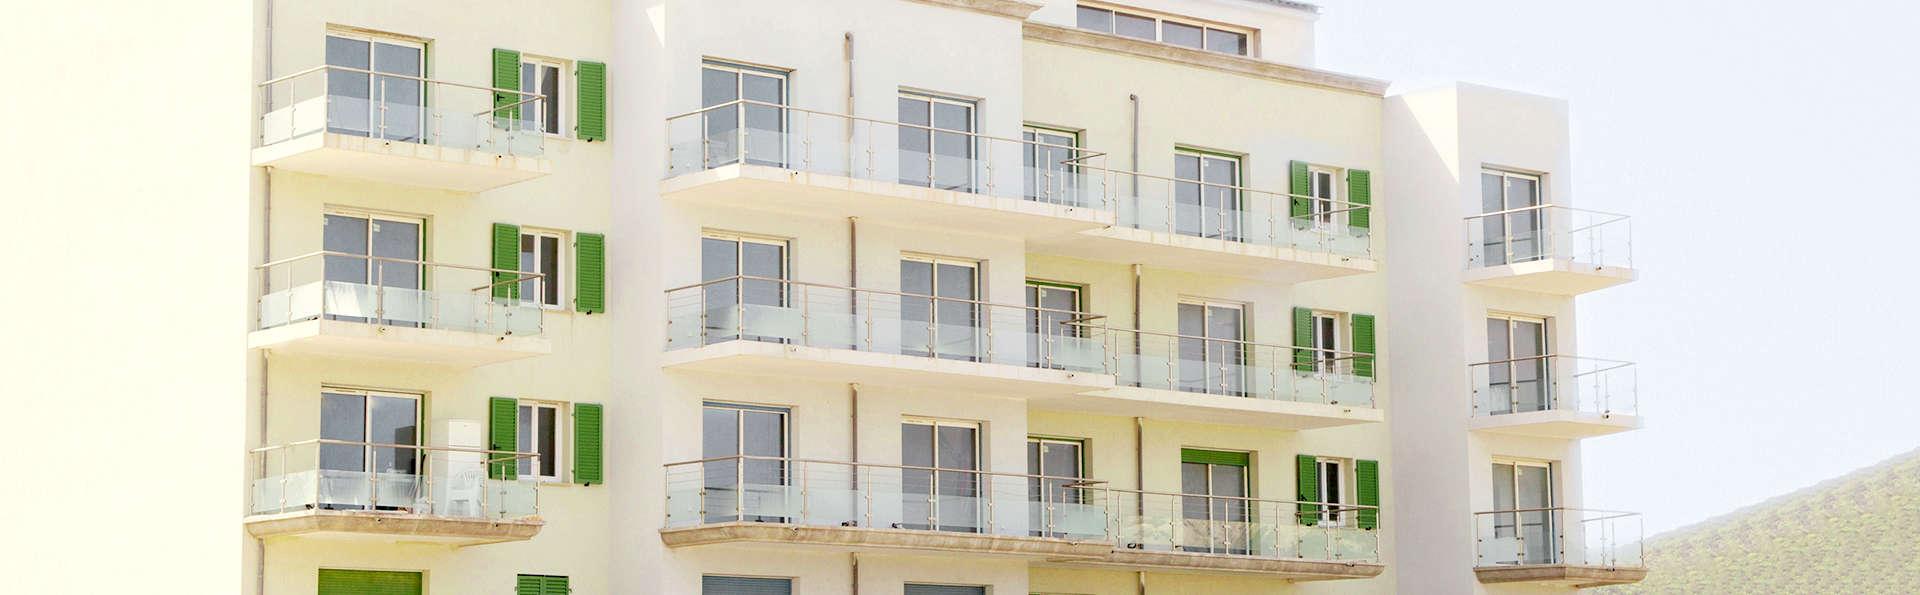 Adonis Macinaggio - EDIT_1_fachada.jpg